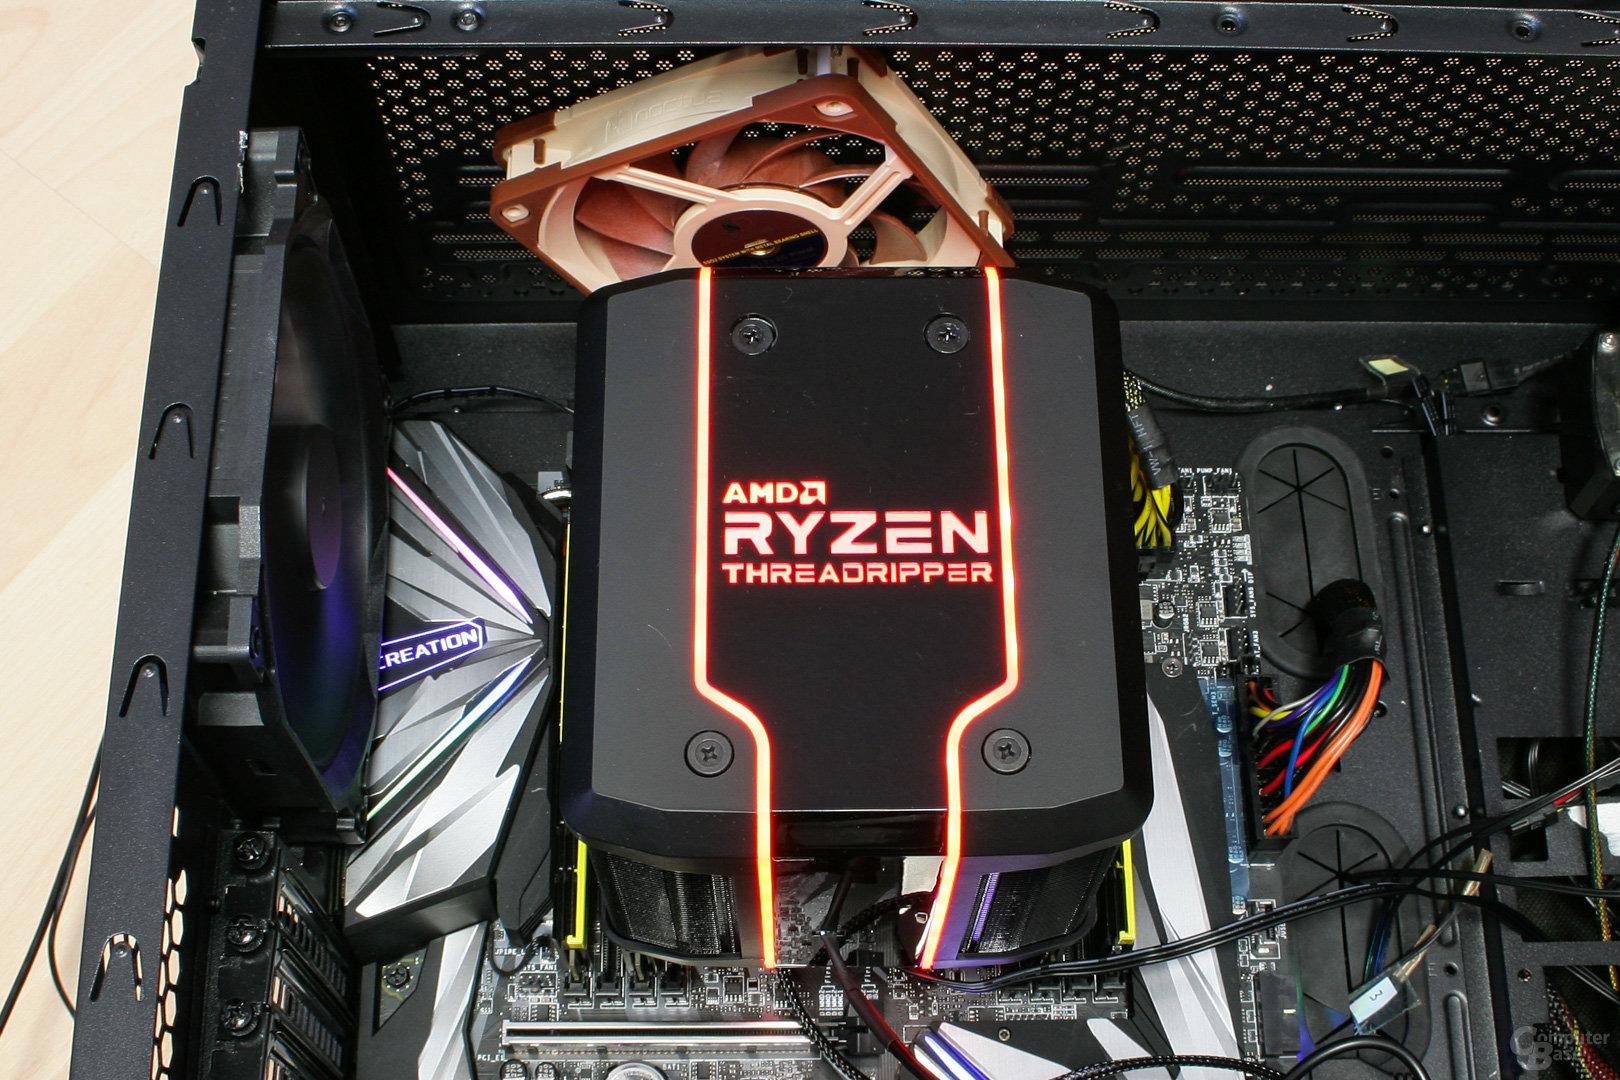 Cooler Master Wraith Ripper im Testsystem